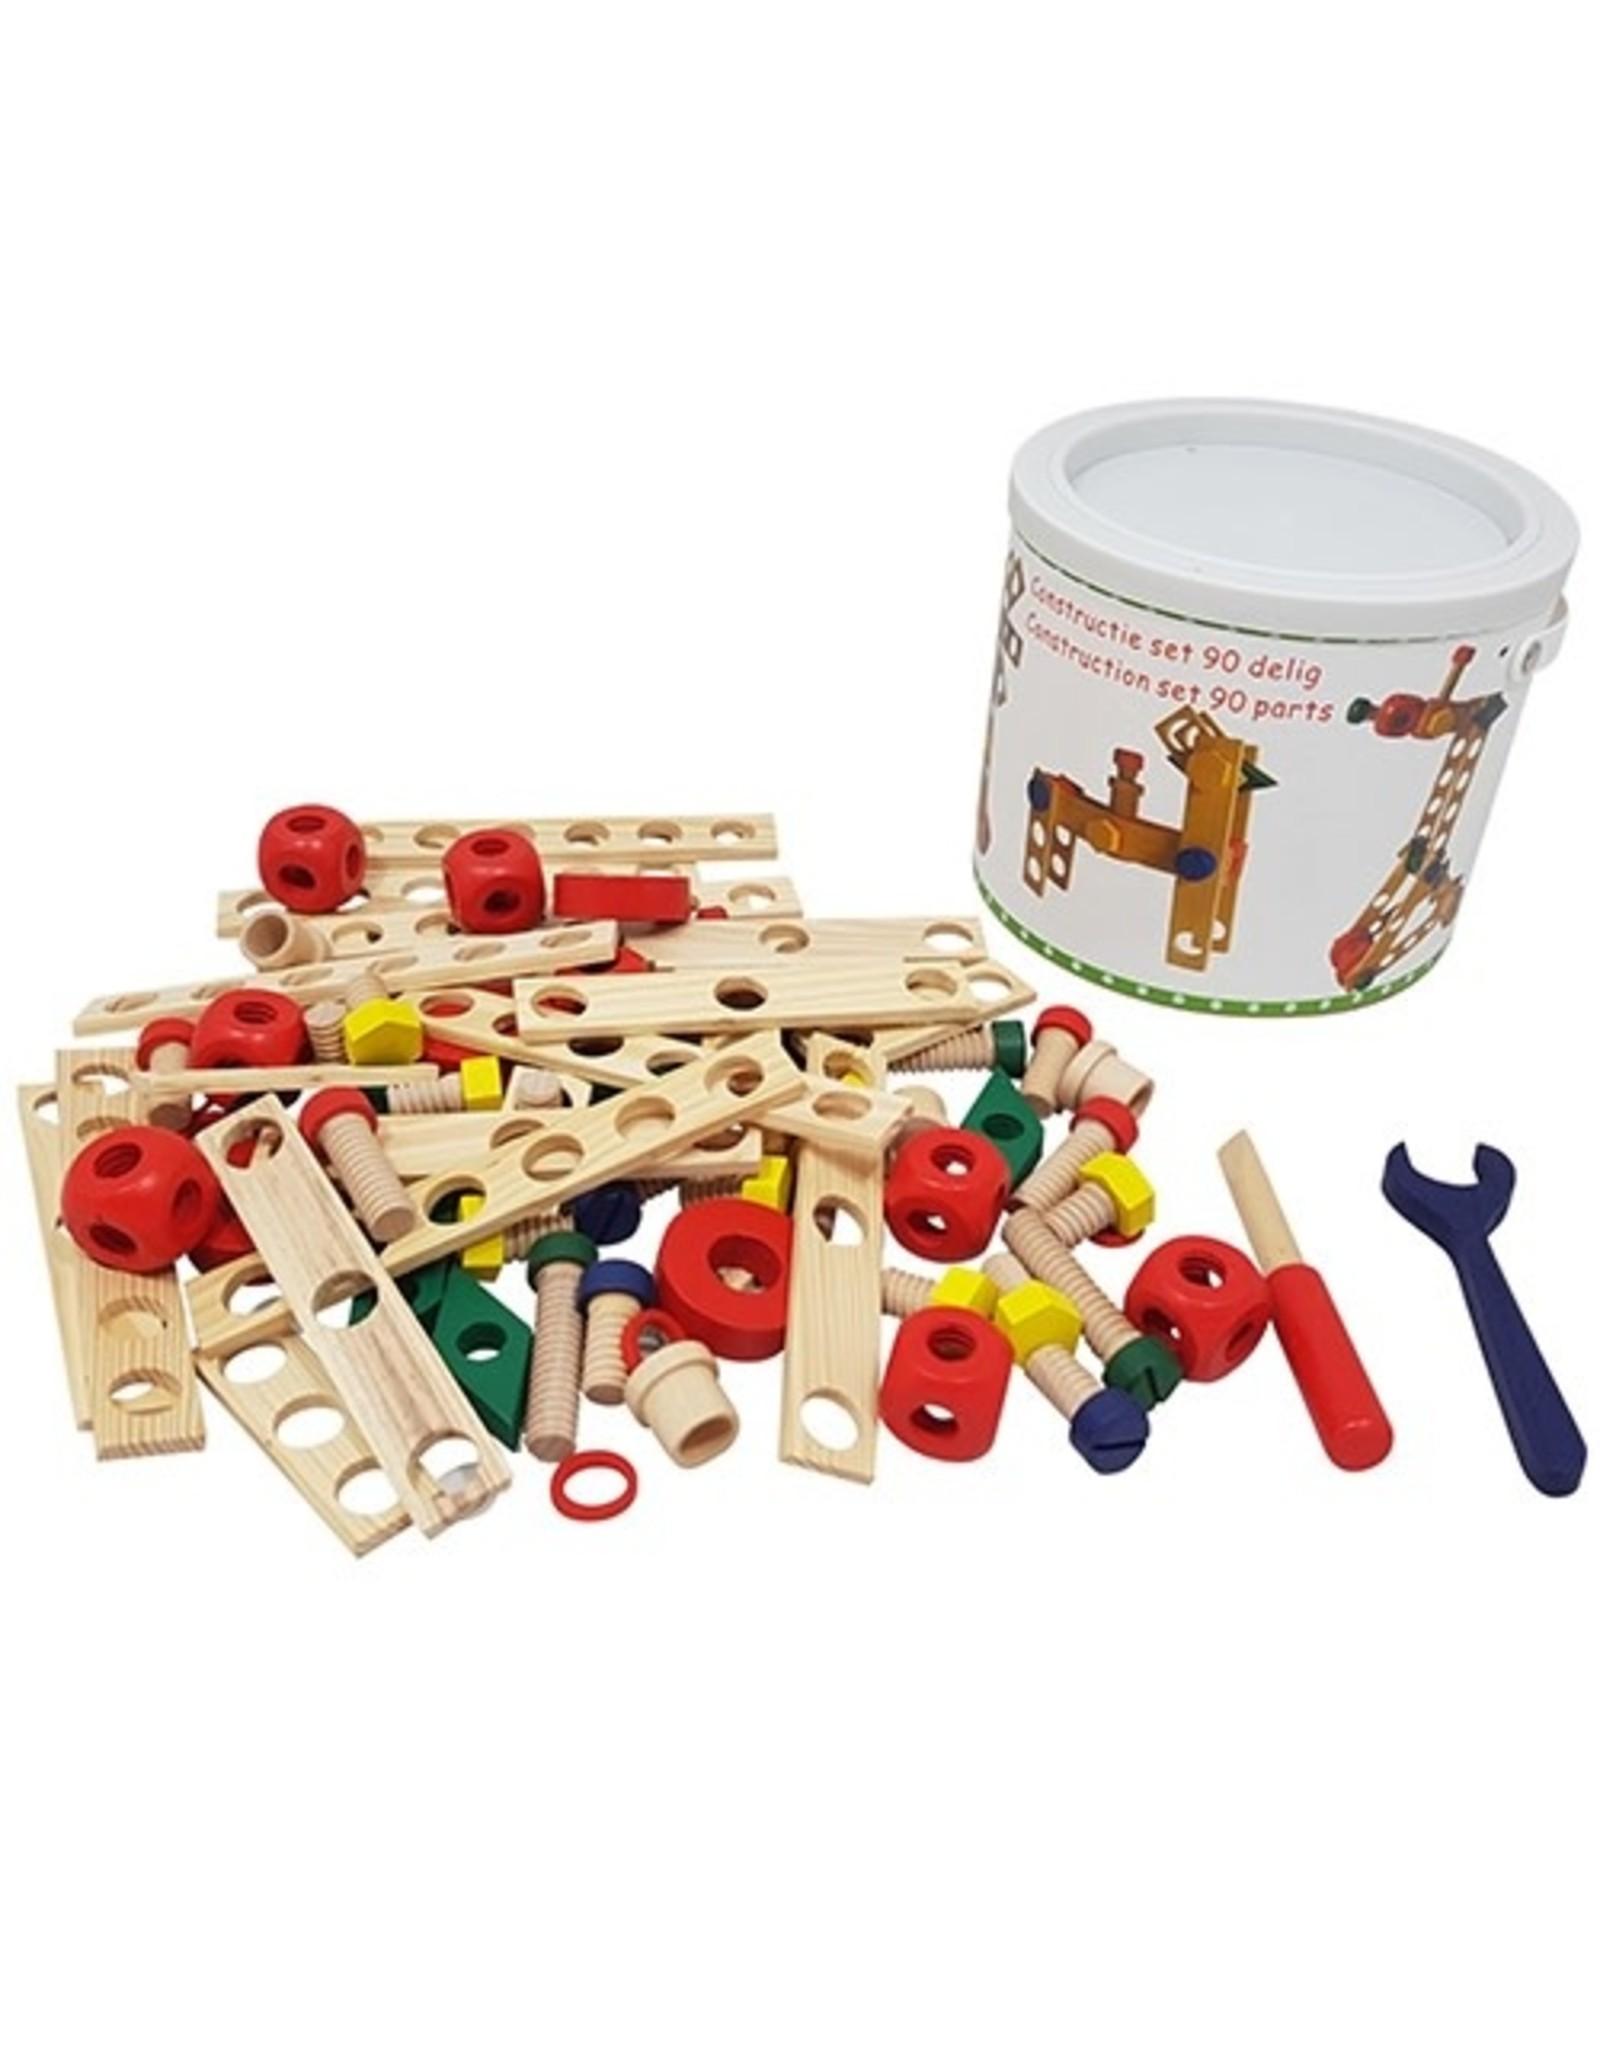 Playwood Constructieset 90 delig